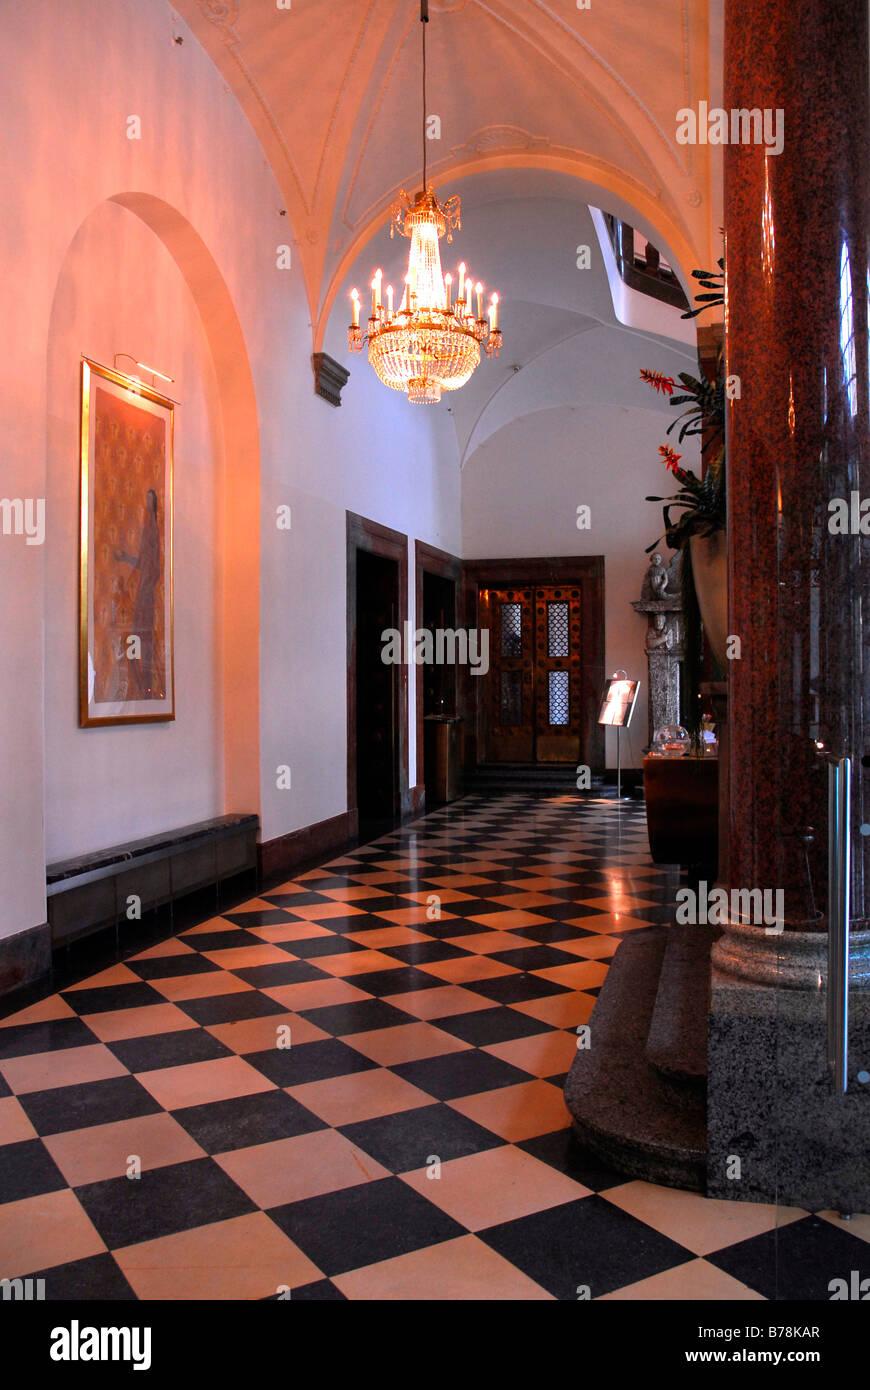 Lenbach Catering lounge, bar cafe restaurant, interior, Otto Street ...